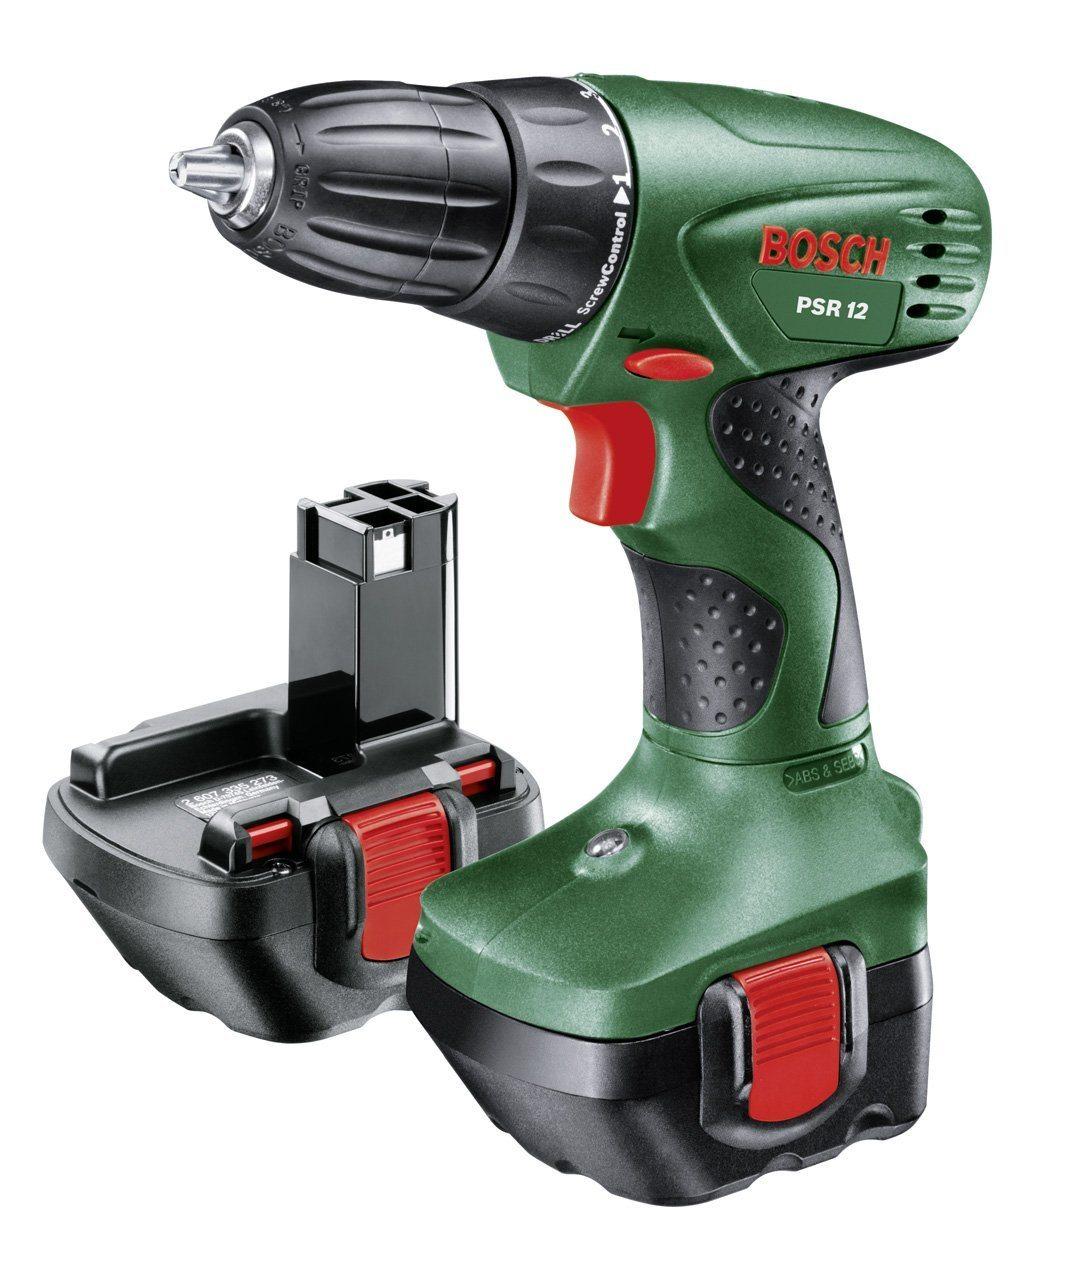 Bosch PSR 12 - Atornillador Psr-12